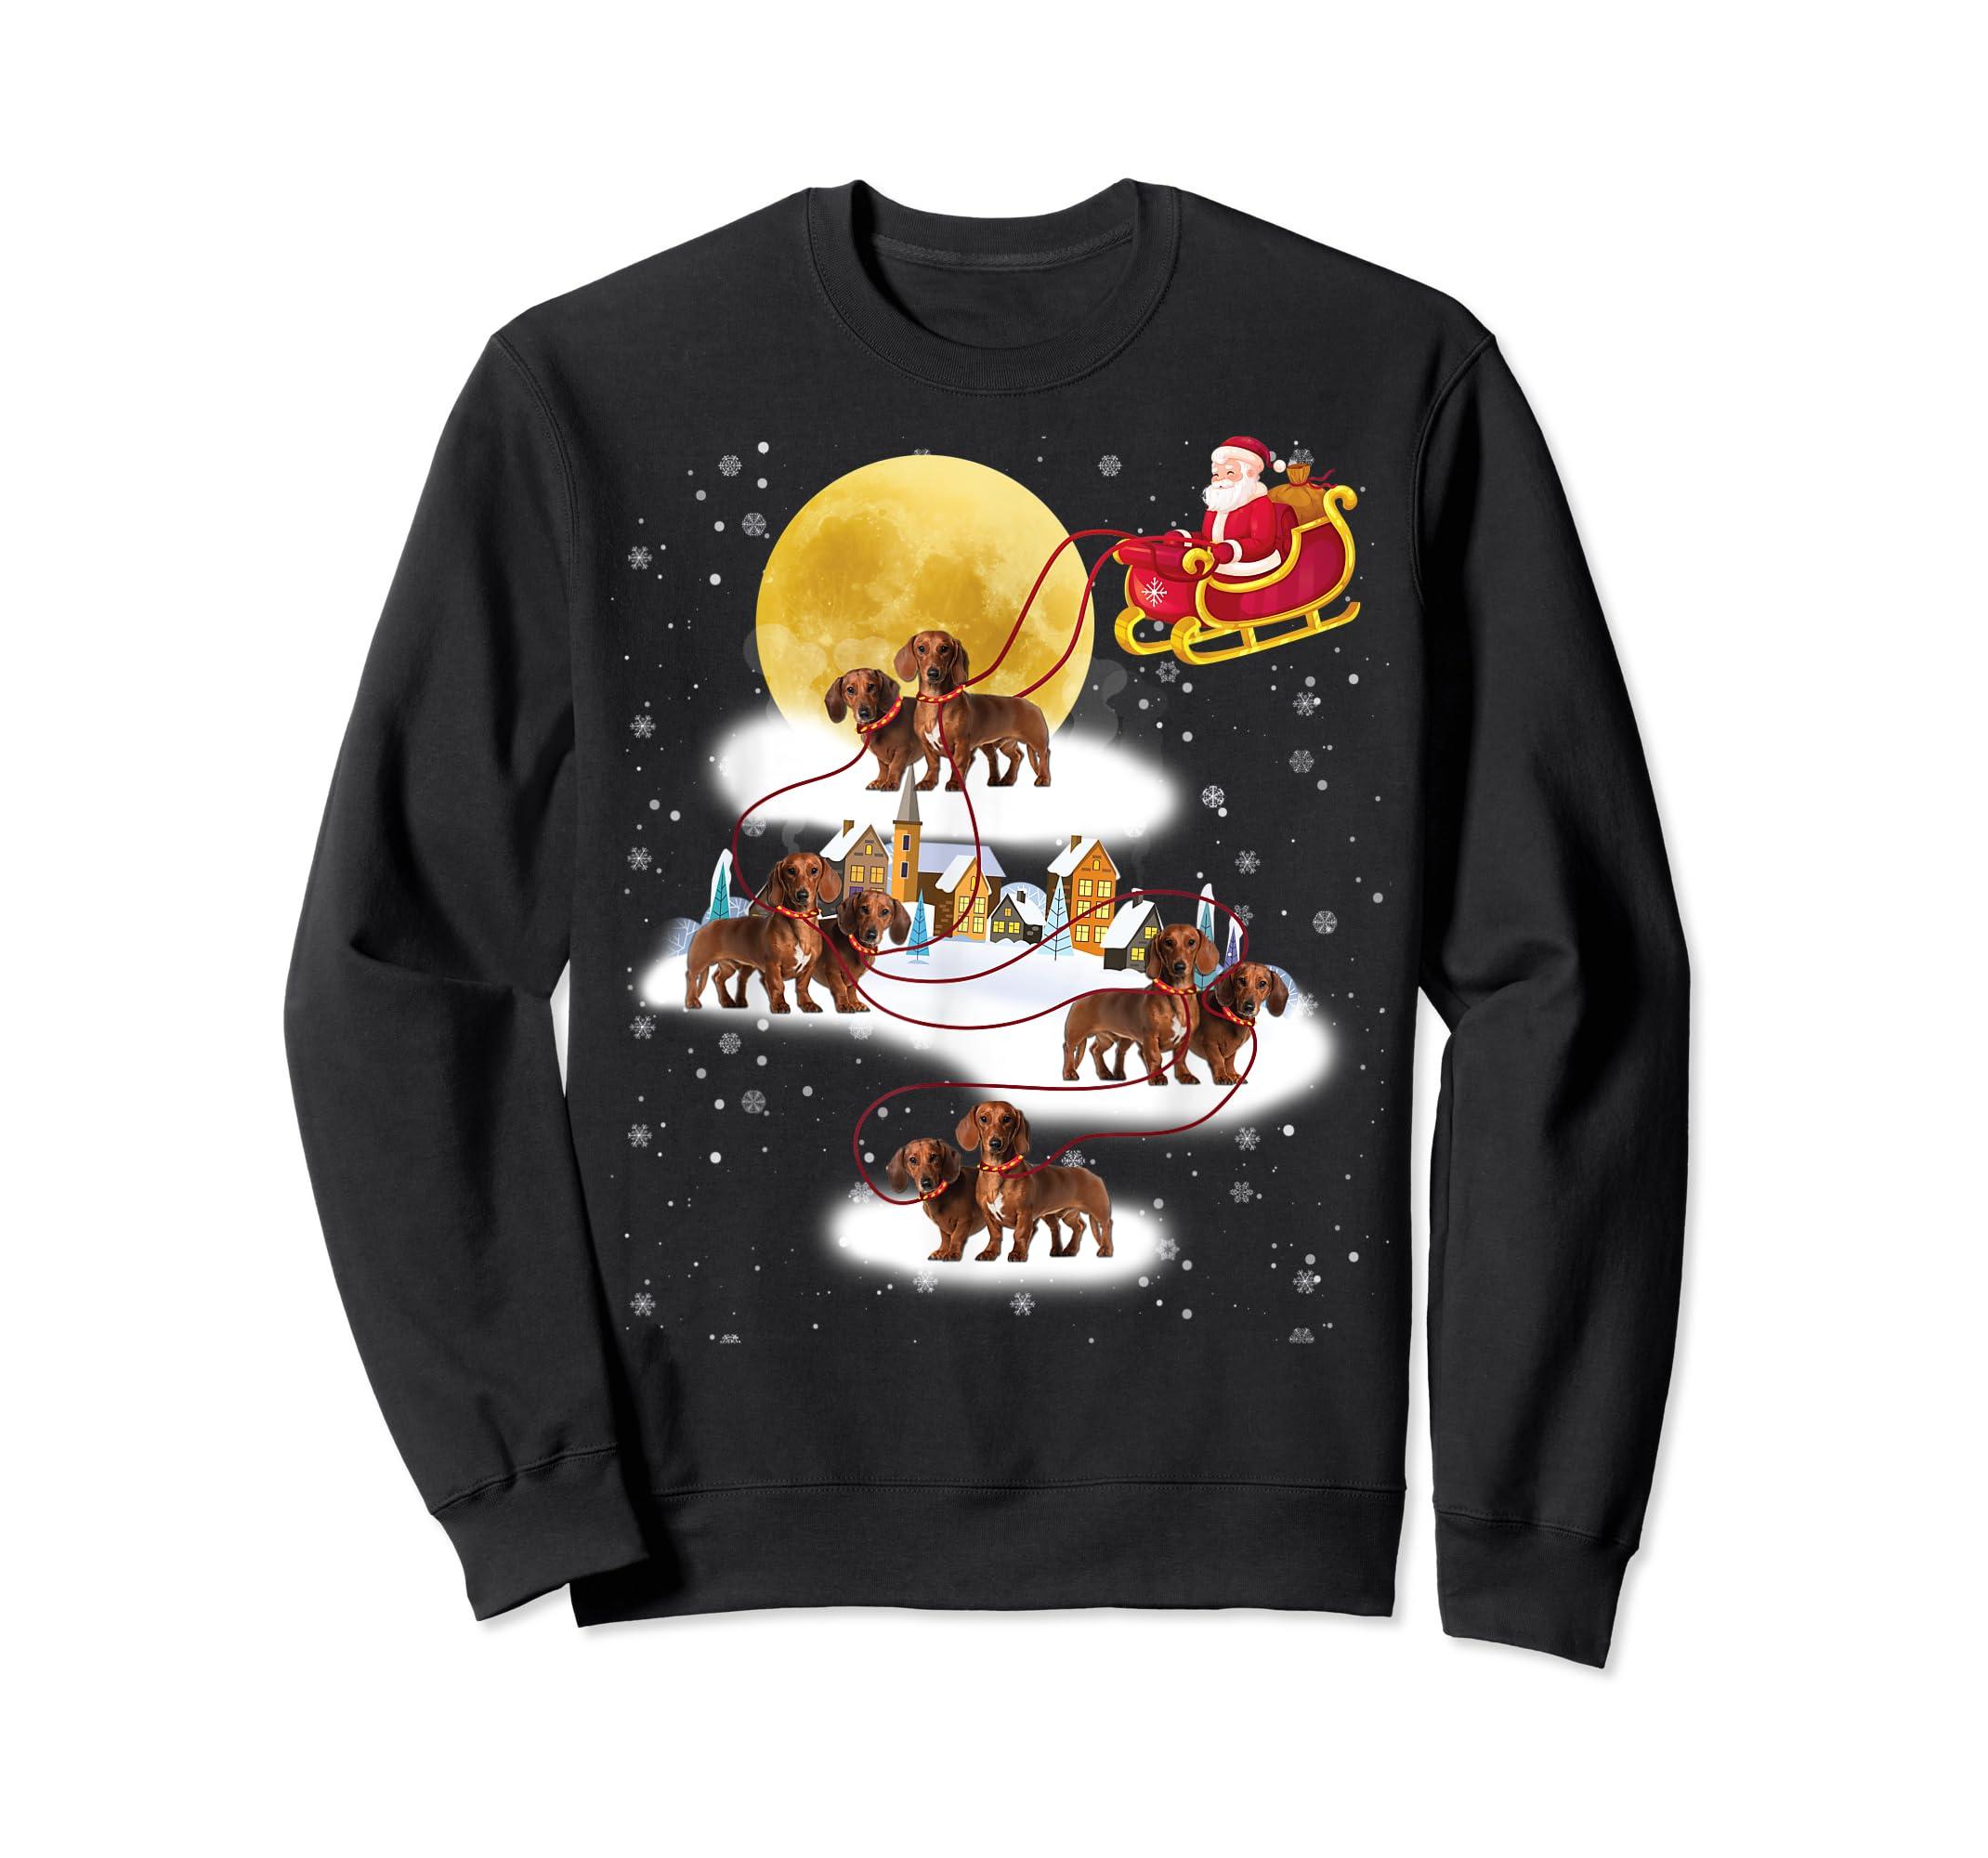 Dachshund Reindeer Christmas 2019 Dog Gift T-Shirt-Sweatshirt-Black